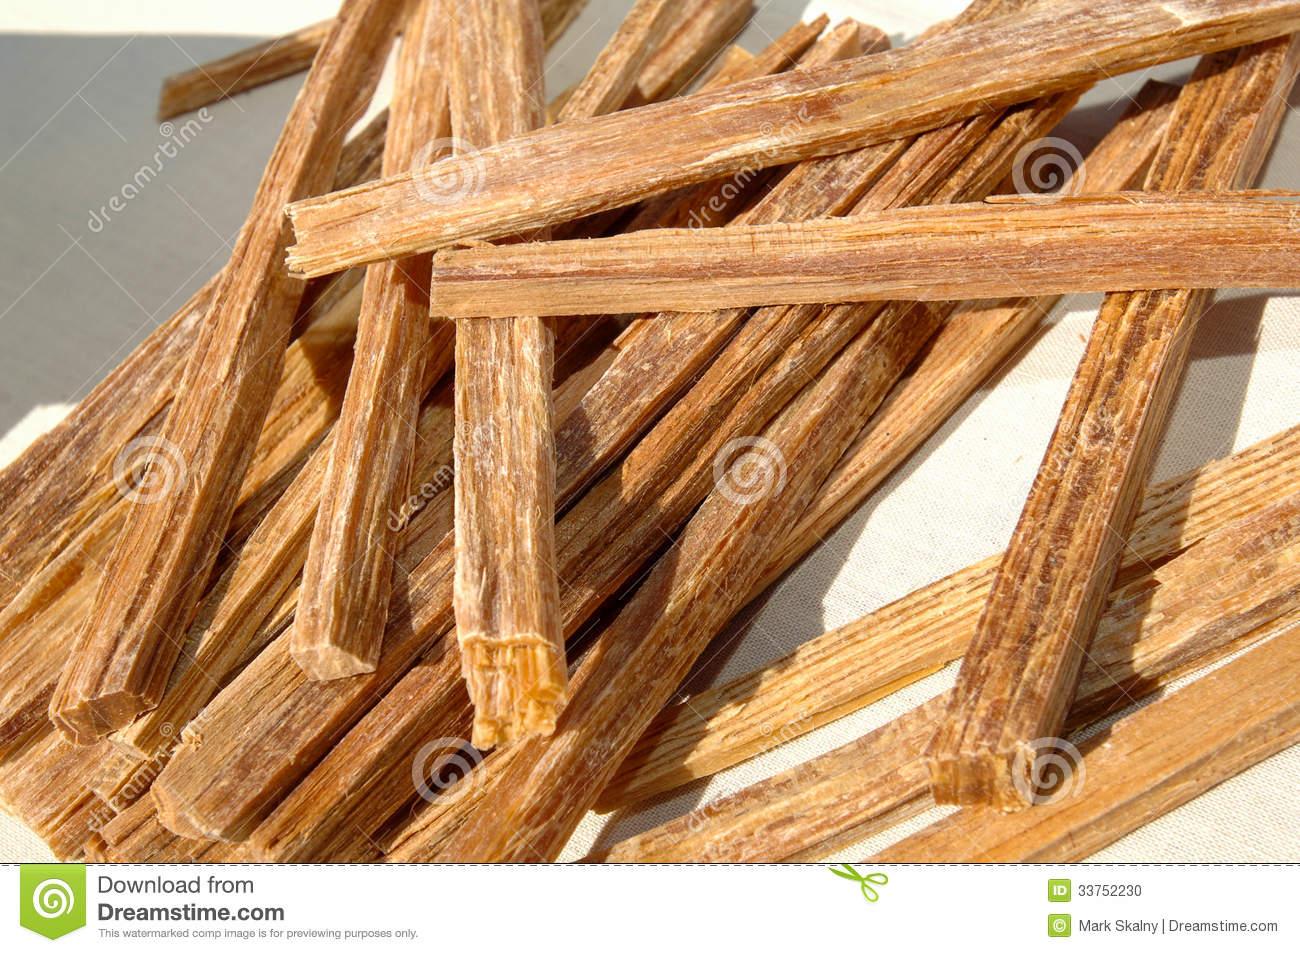 Tinder Wood Stock Photo.